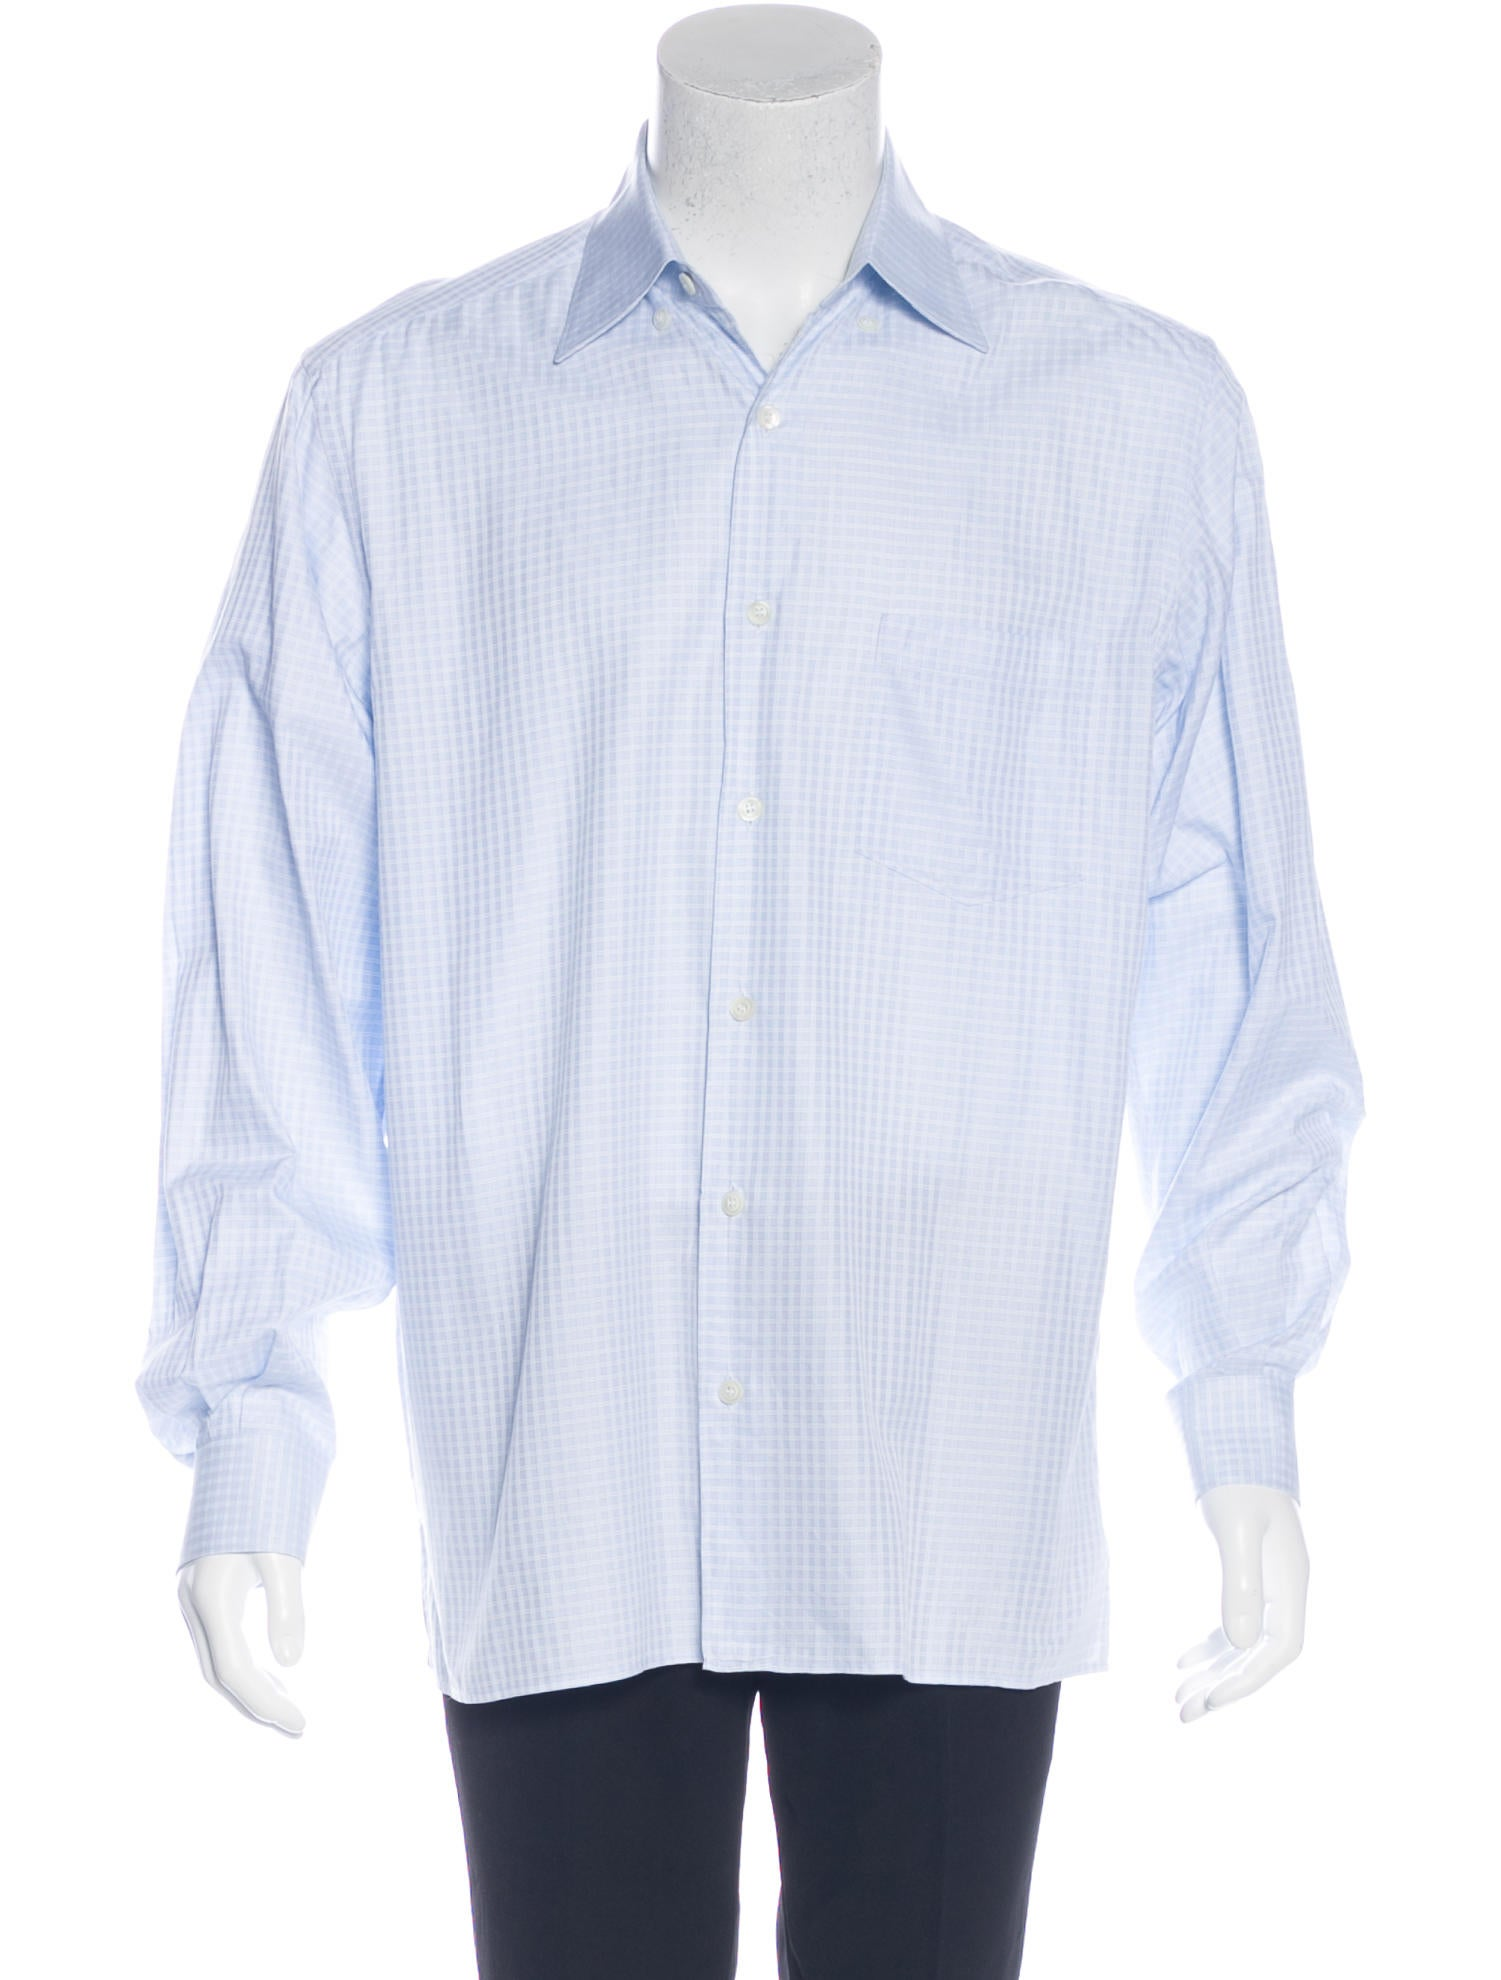 ermenegildo zegna plaid woven shirt clothing zgn24893 the realreal. Black Bedroom Furniture Sets. Home Design Ideas